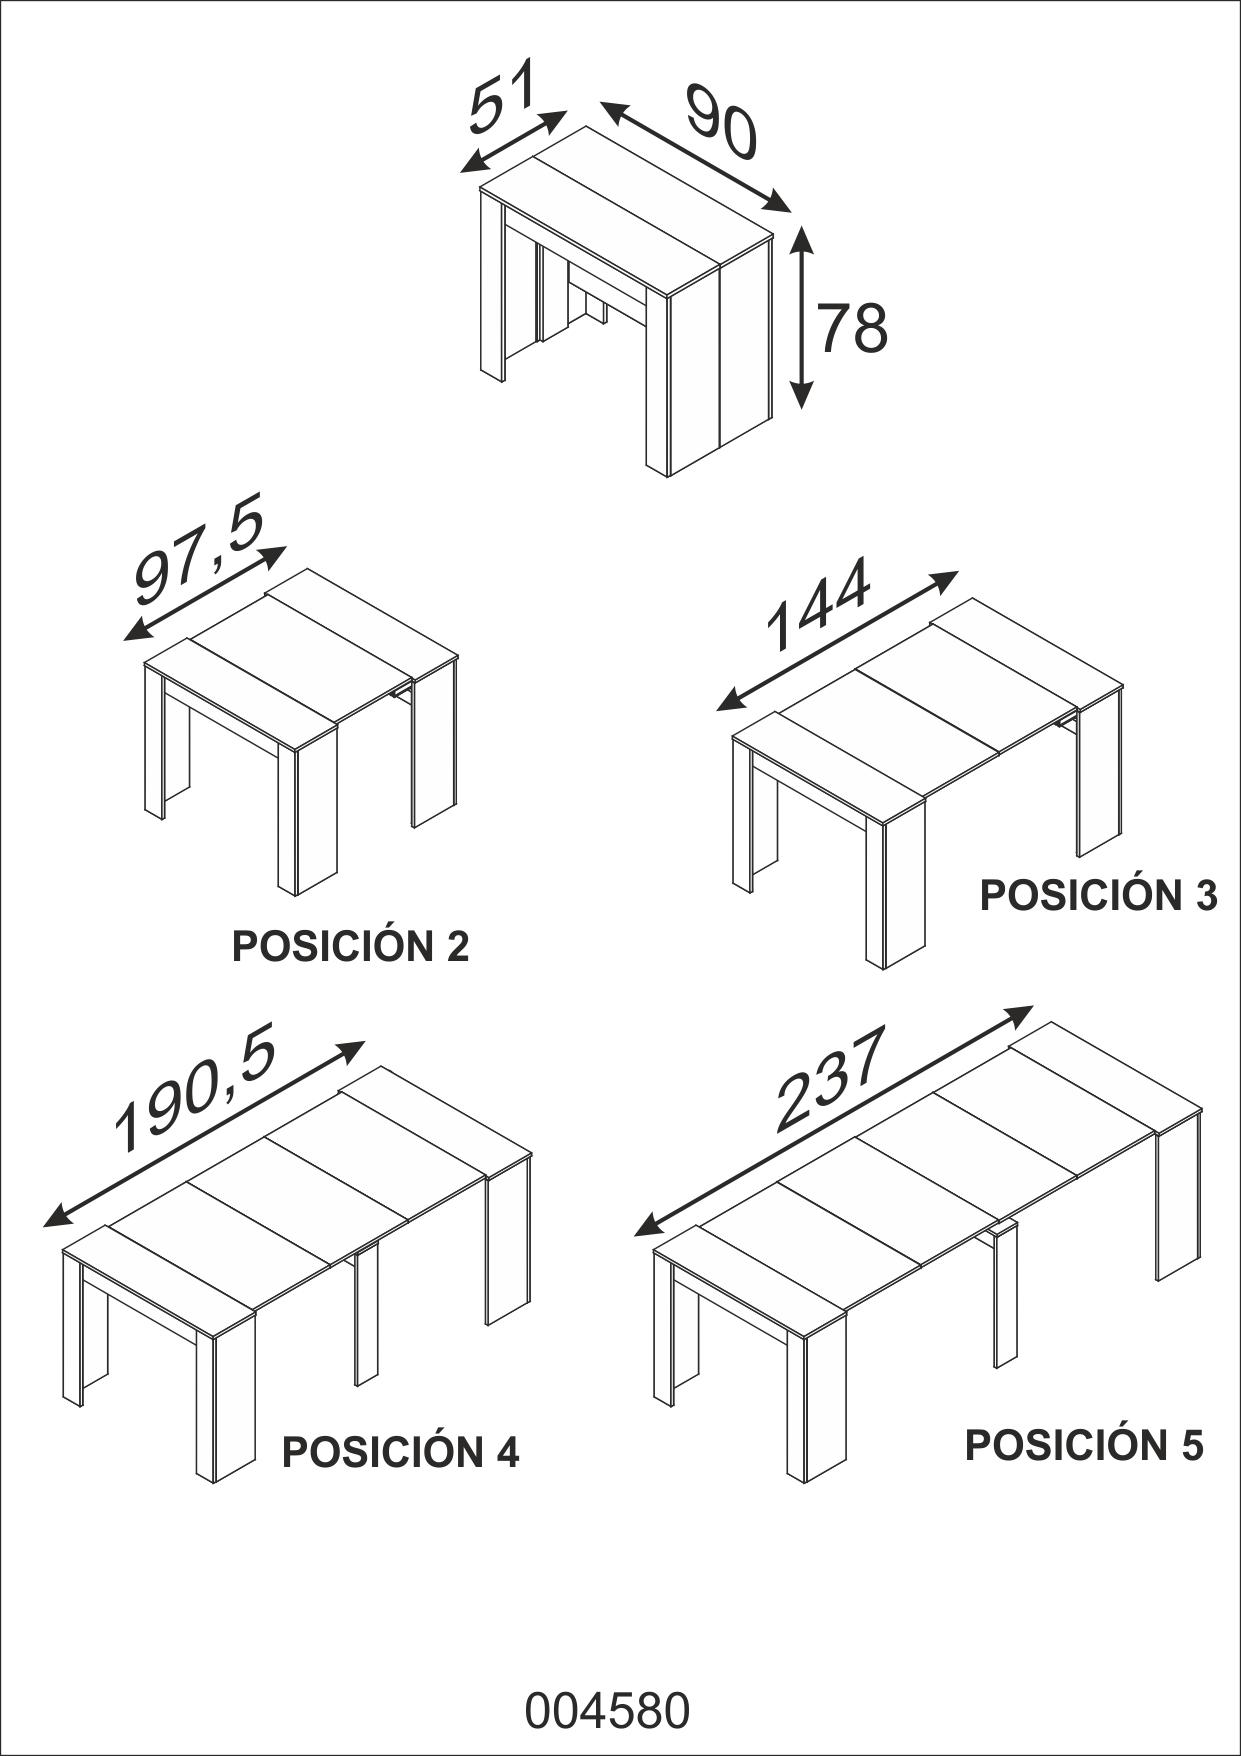 004580-dimensions%201.jpg